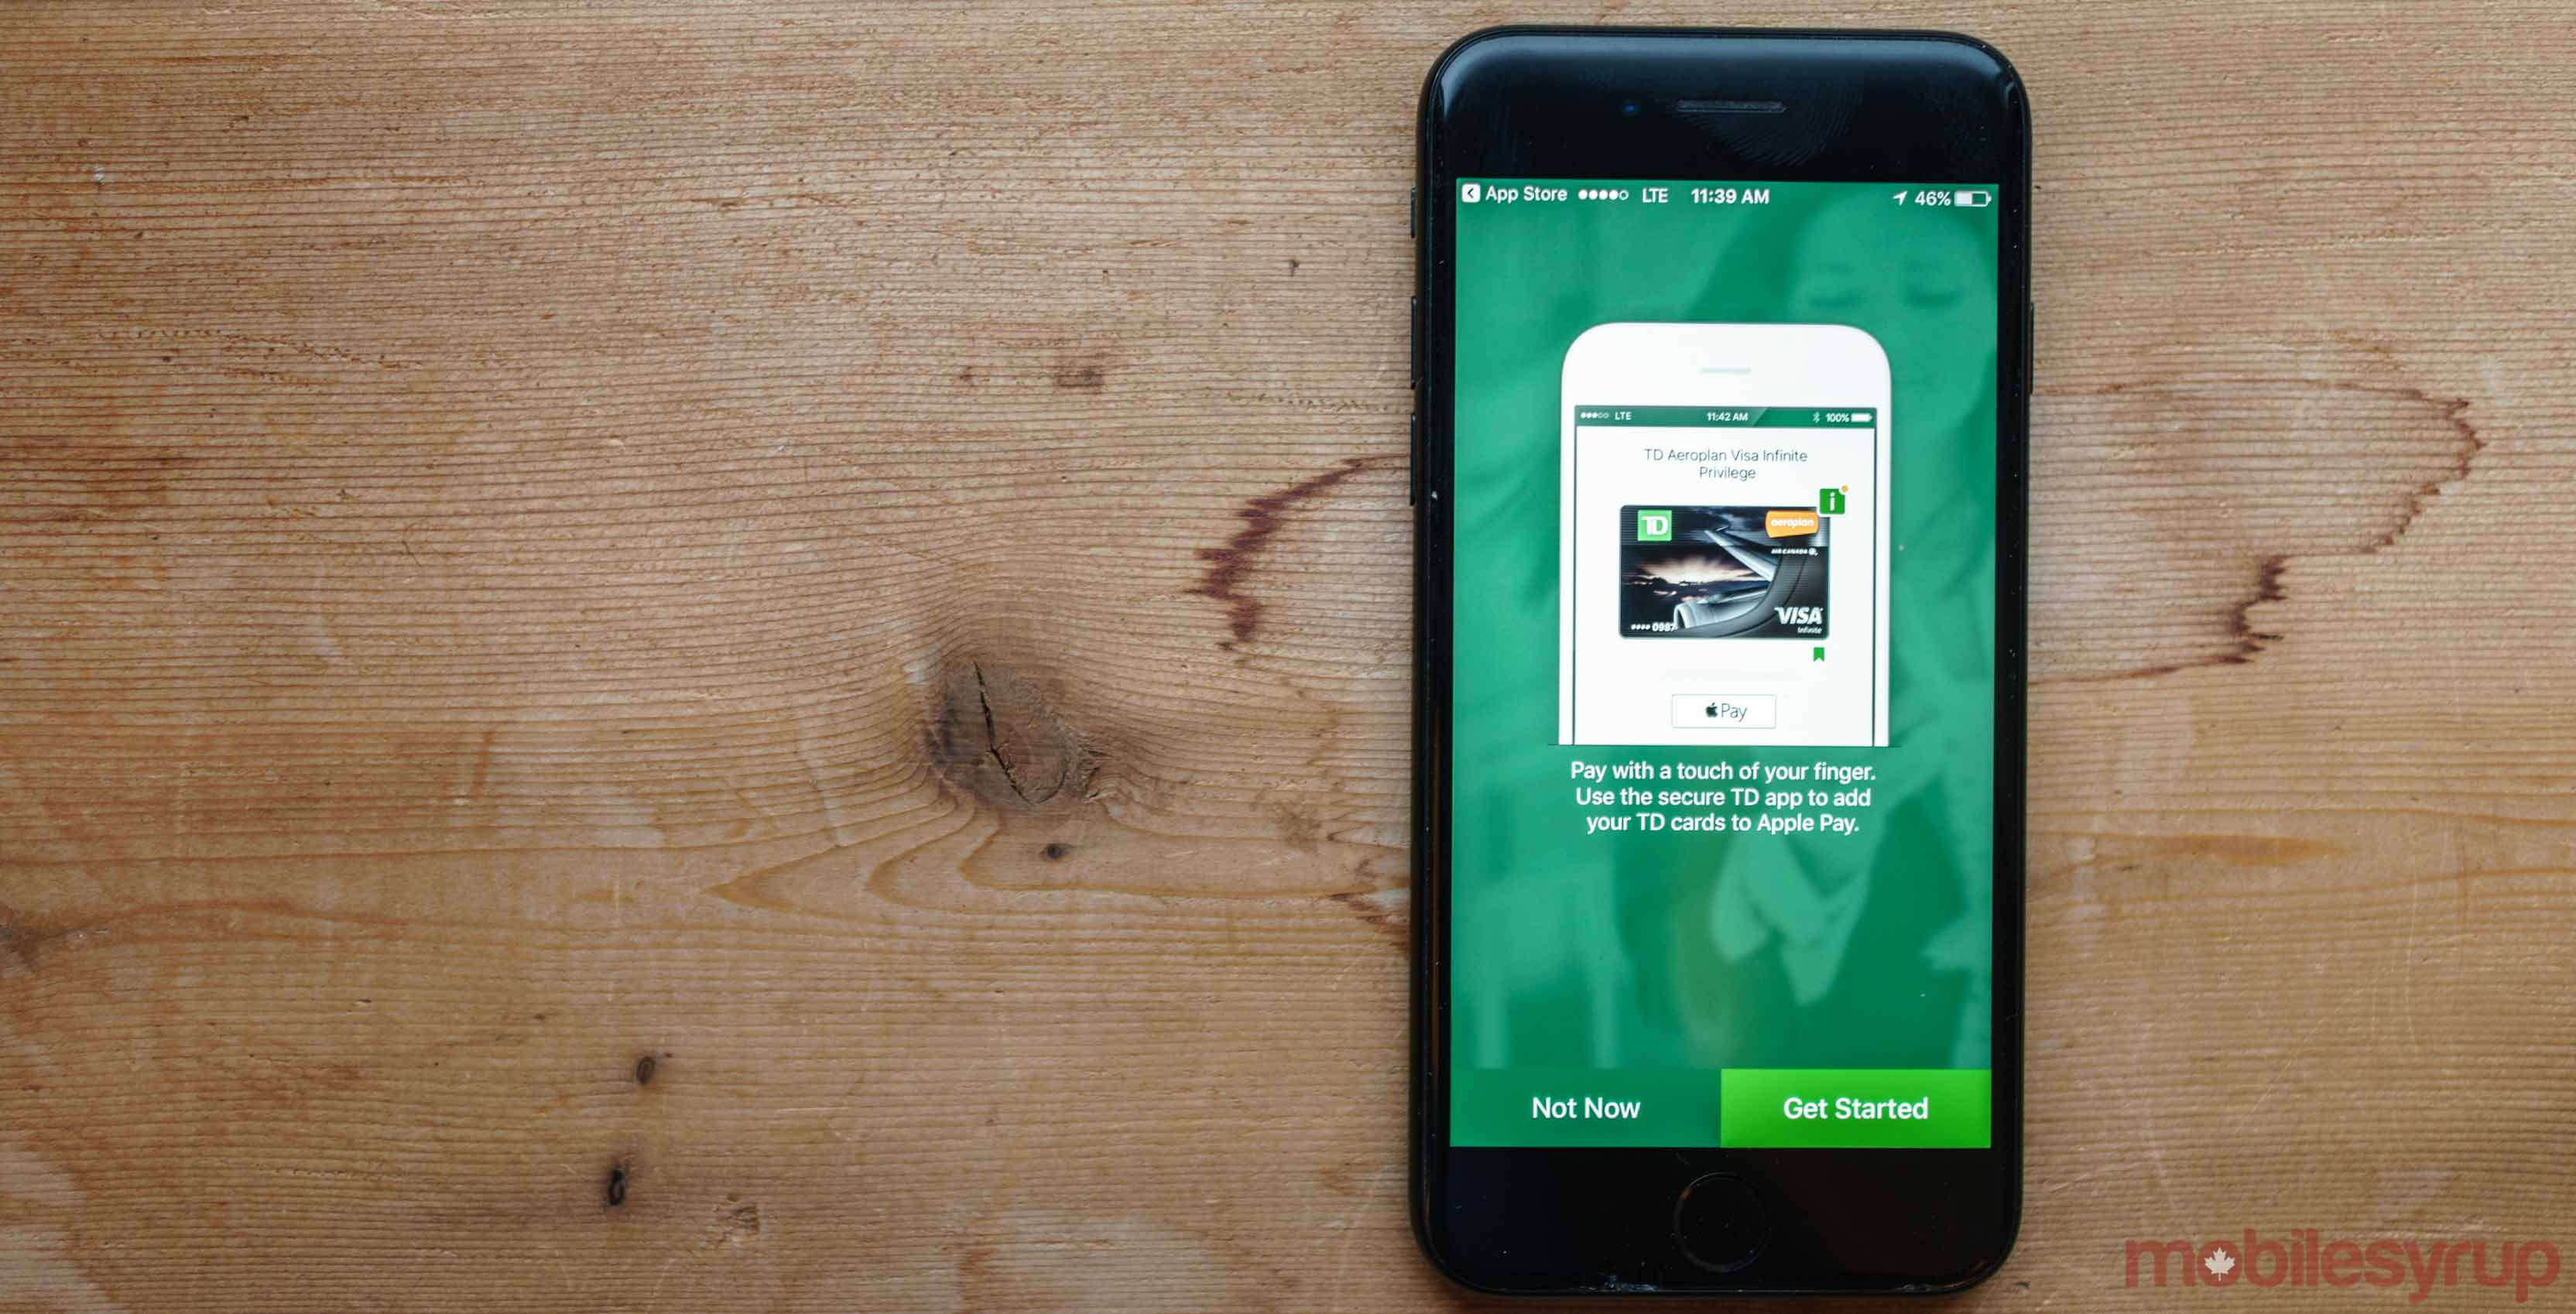 TD Canada Bank app on iPhone